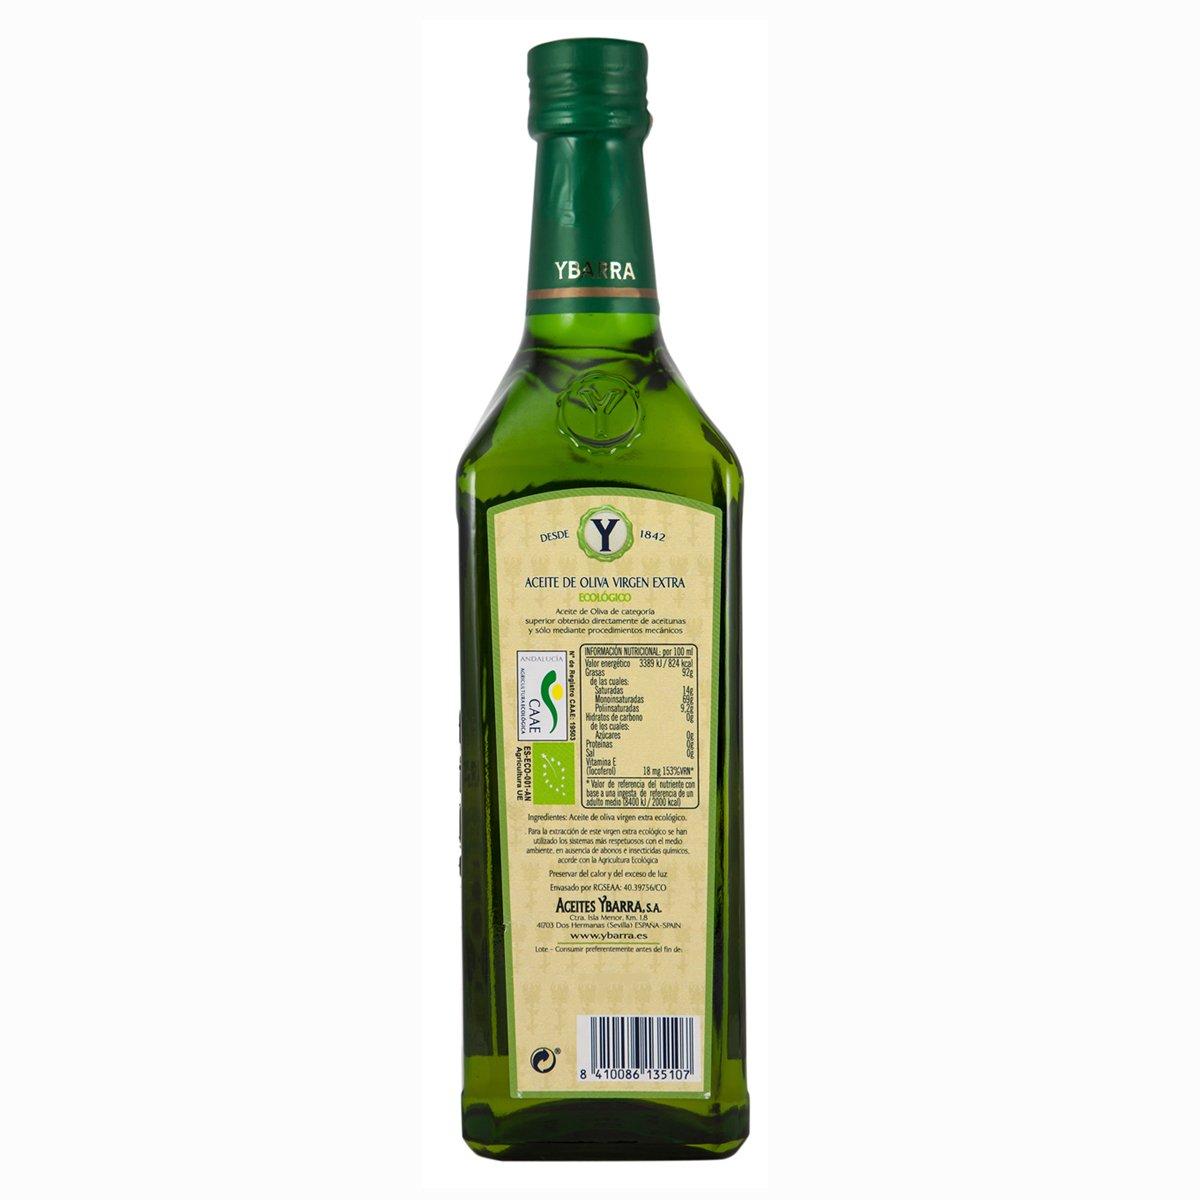 Ybarra Aceite de Oliva Virgen Extra Ecológico - 4 Recipientes de 750 ml - Total: 3000 ml